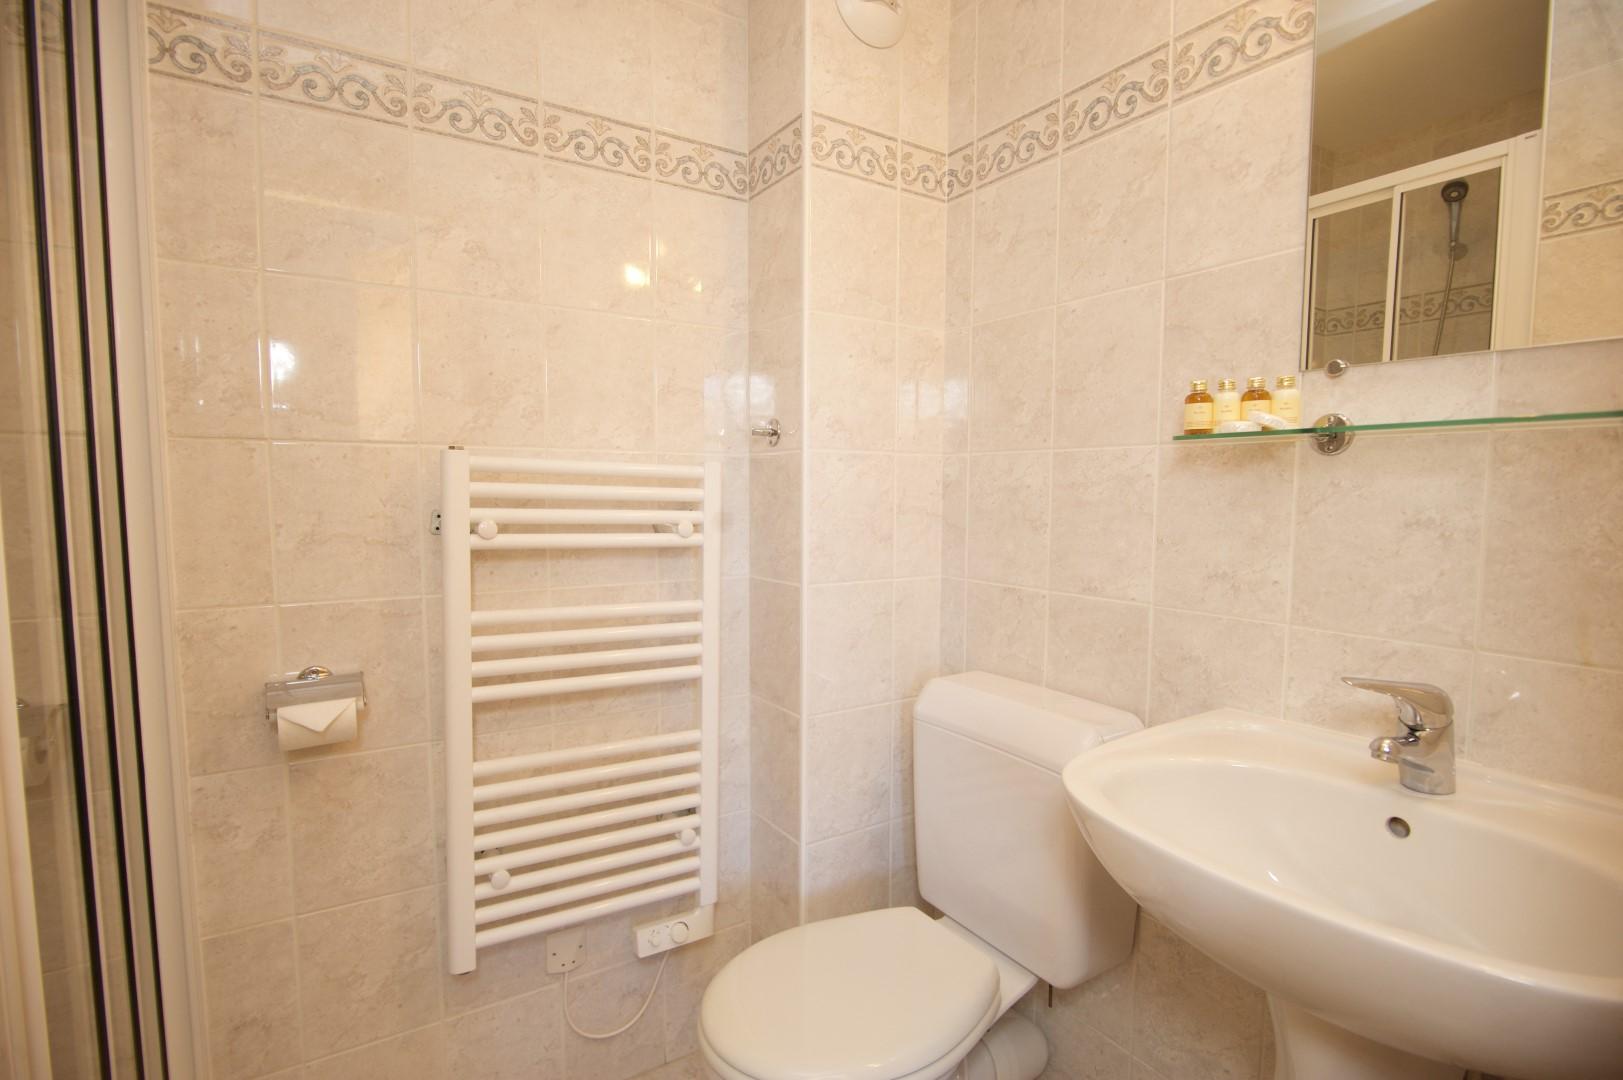 Anniek Typical Shower Room